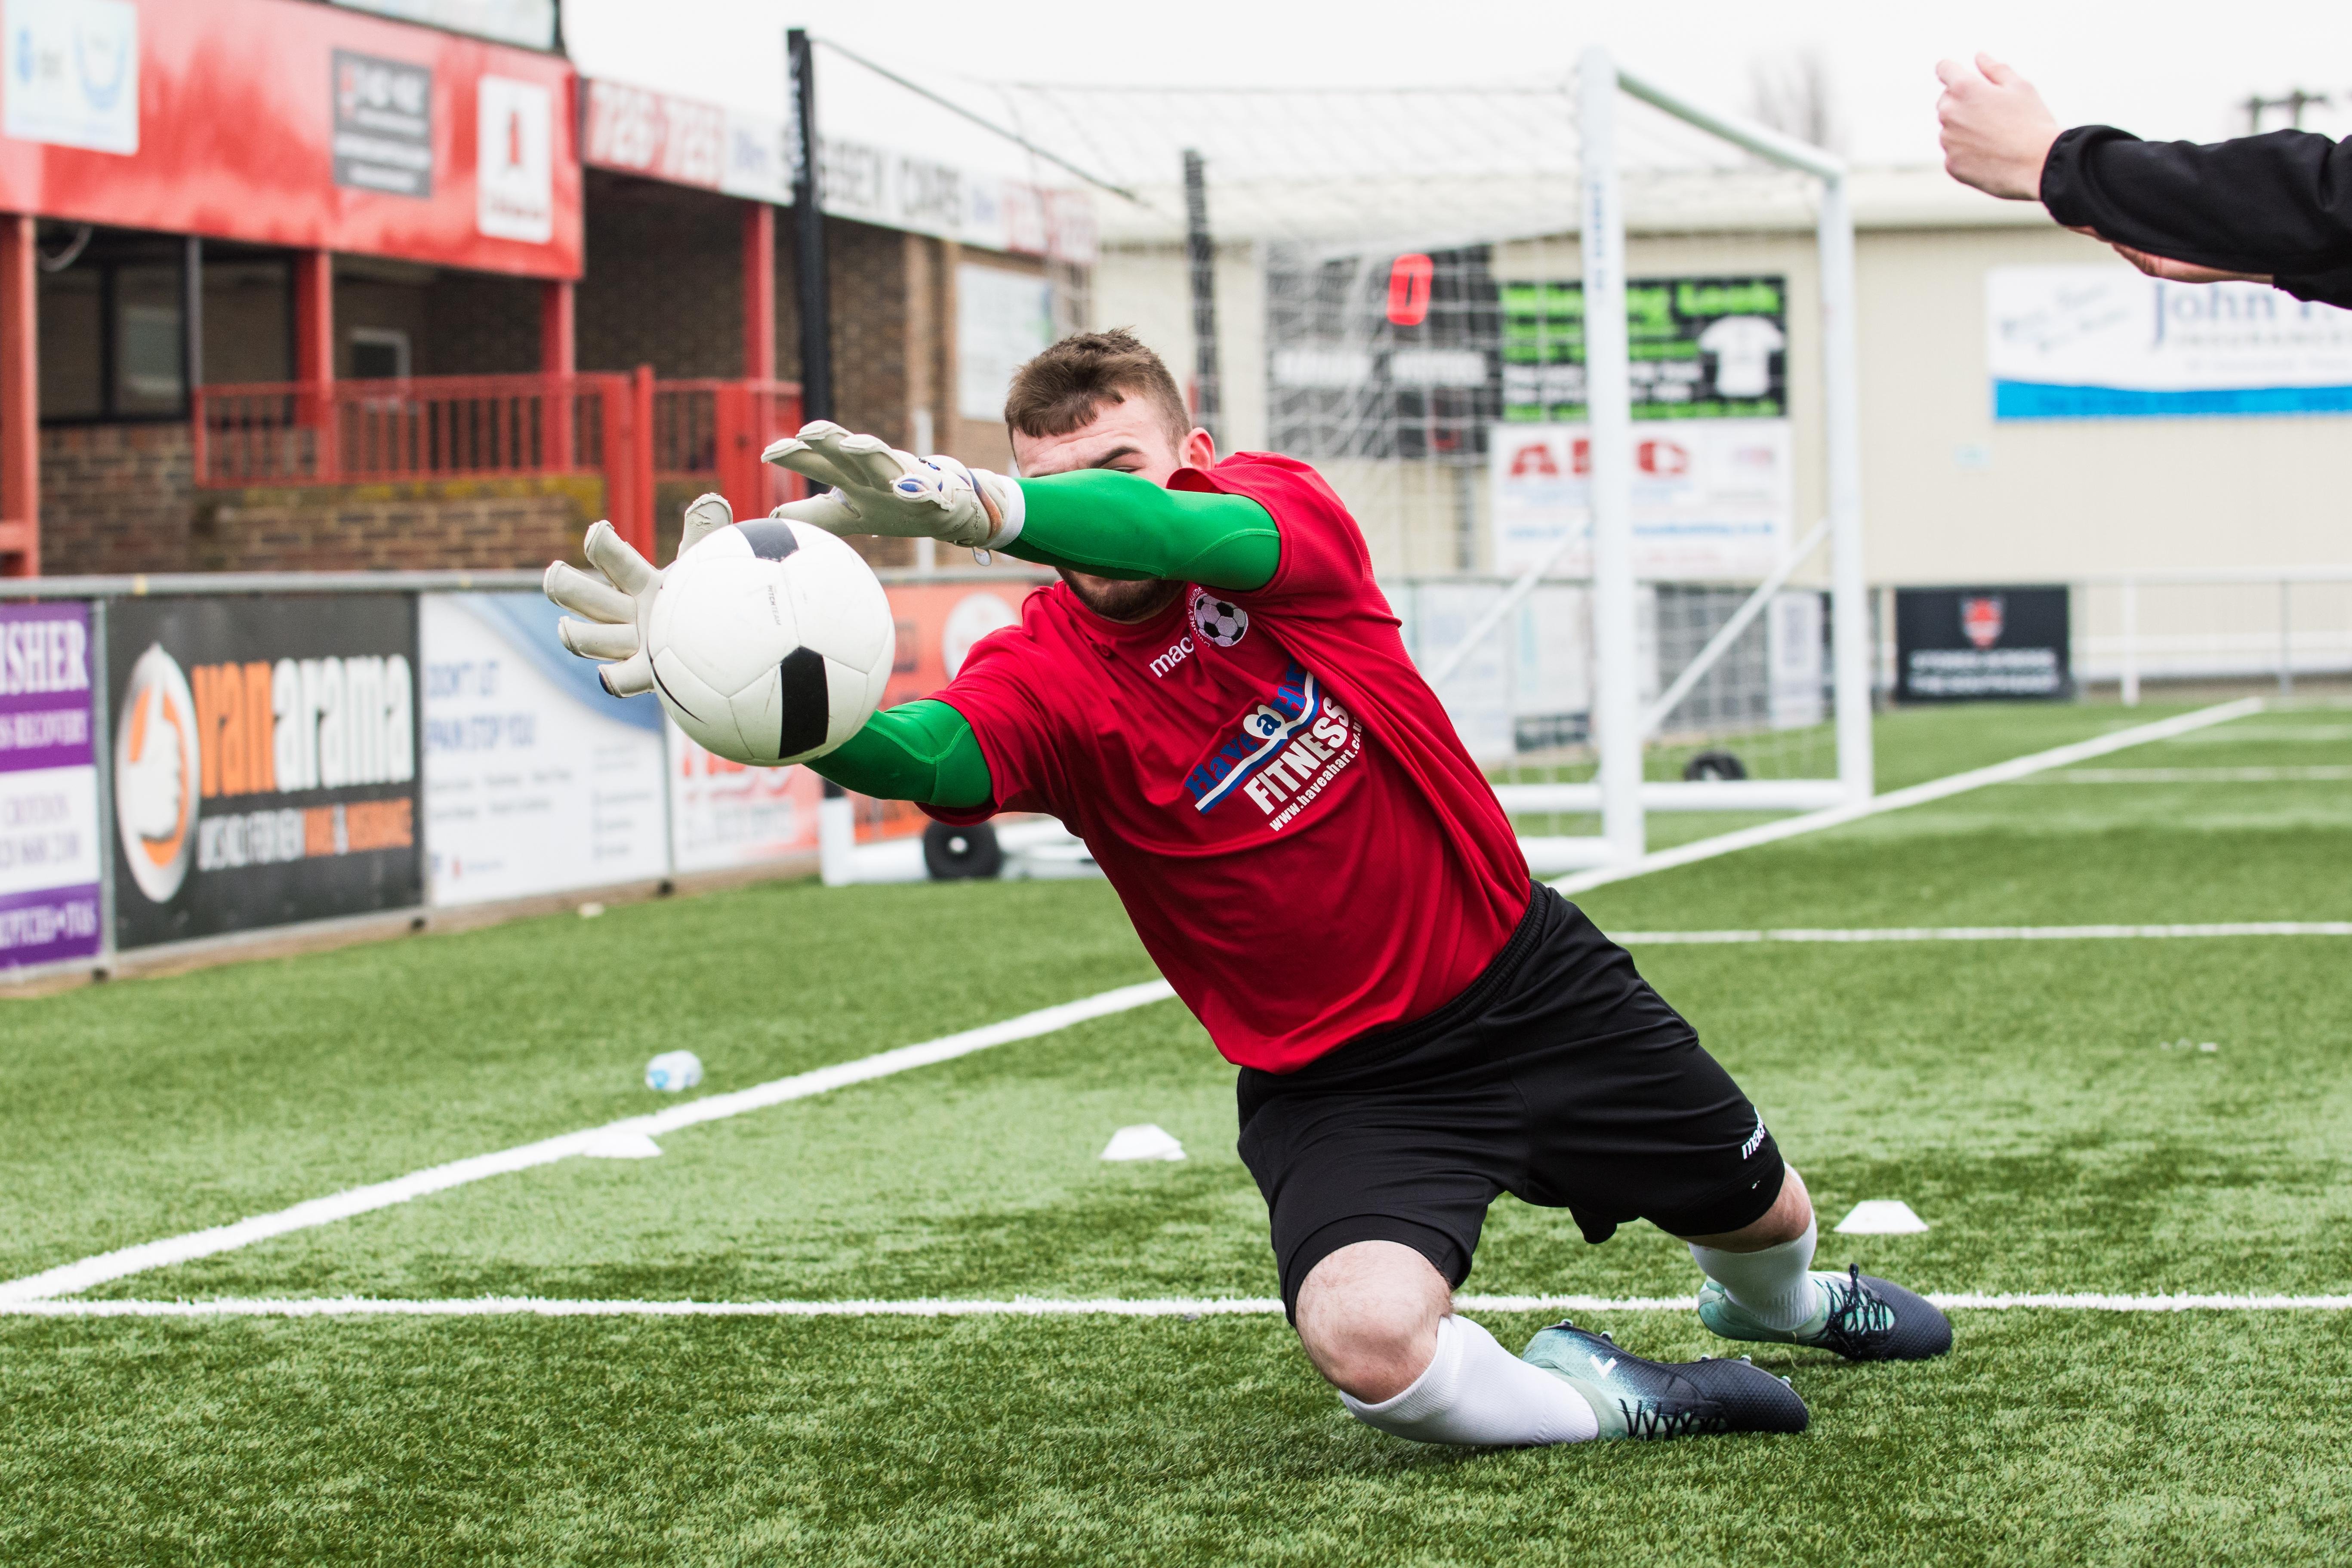 DAVID_JEFFERY Langney Wanderers FC vs Bexhill United FC 03.03.18 11